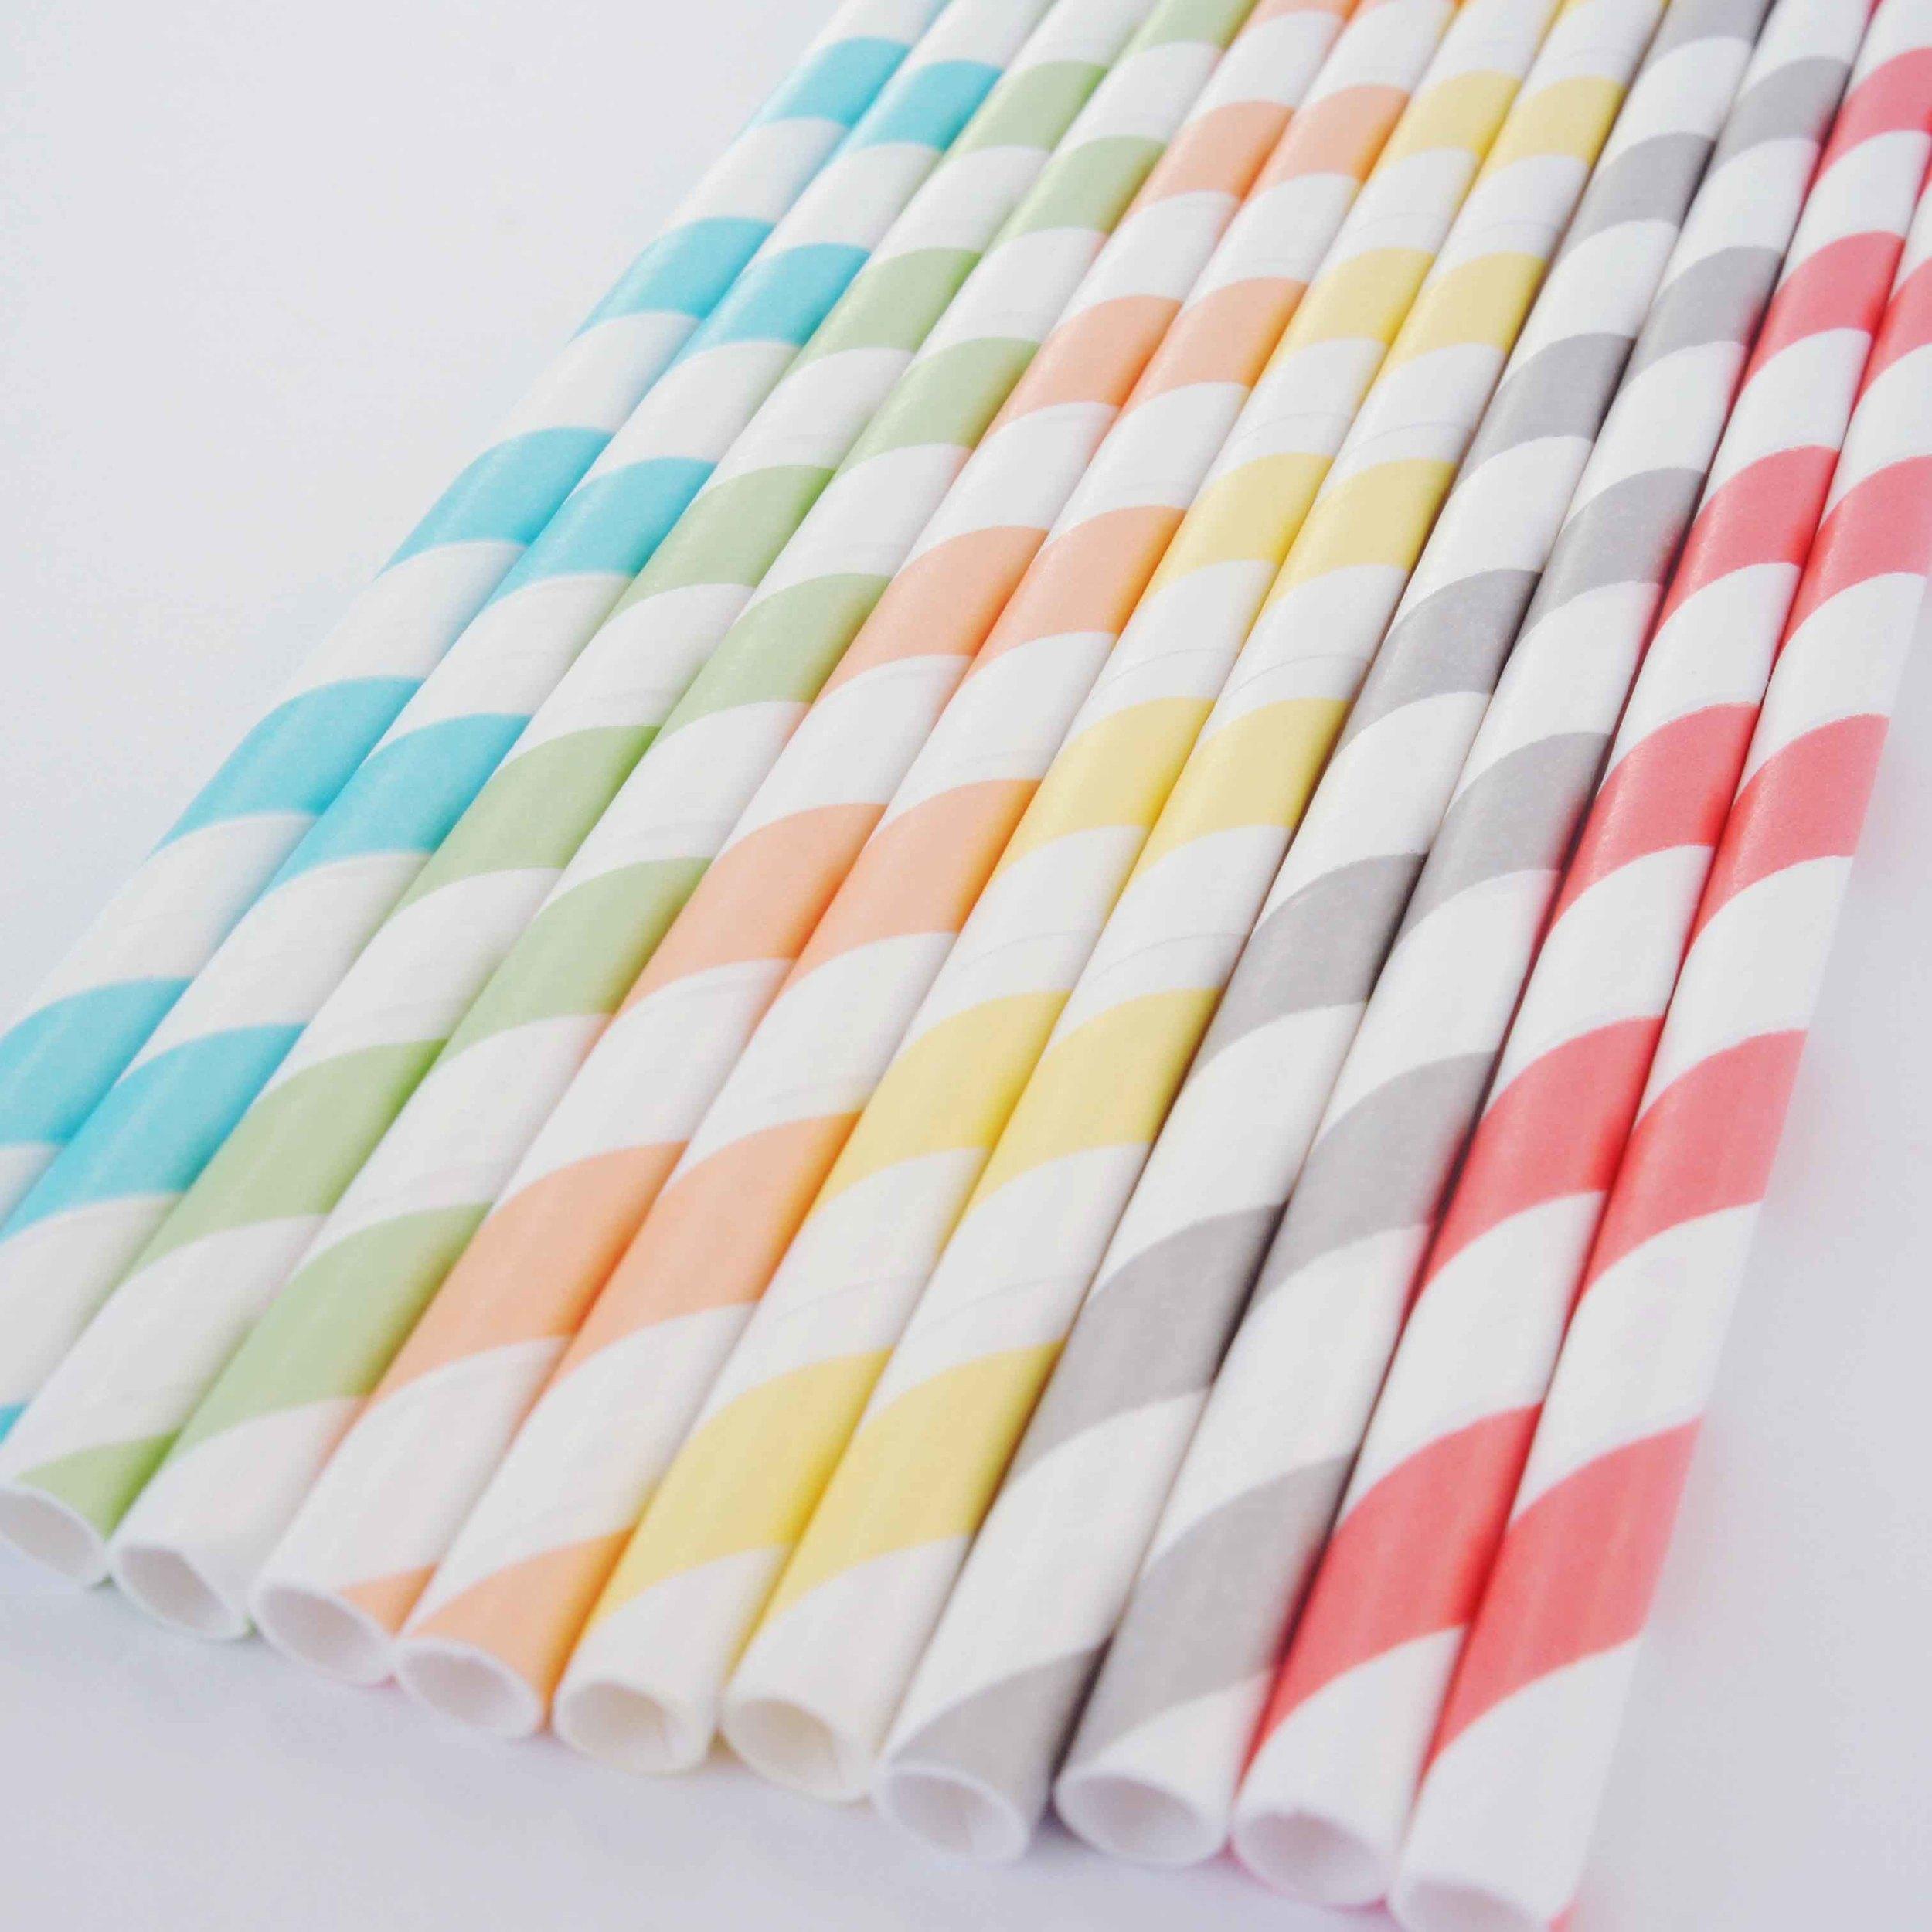 straws copy.jpg